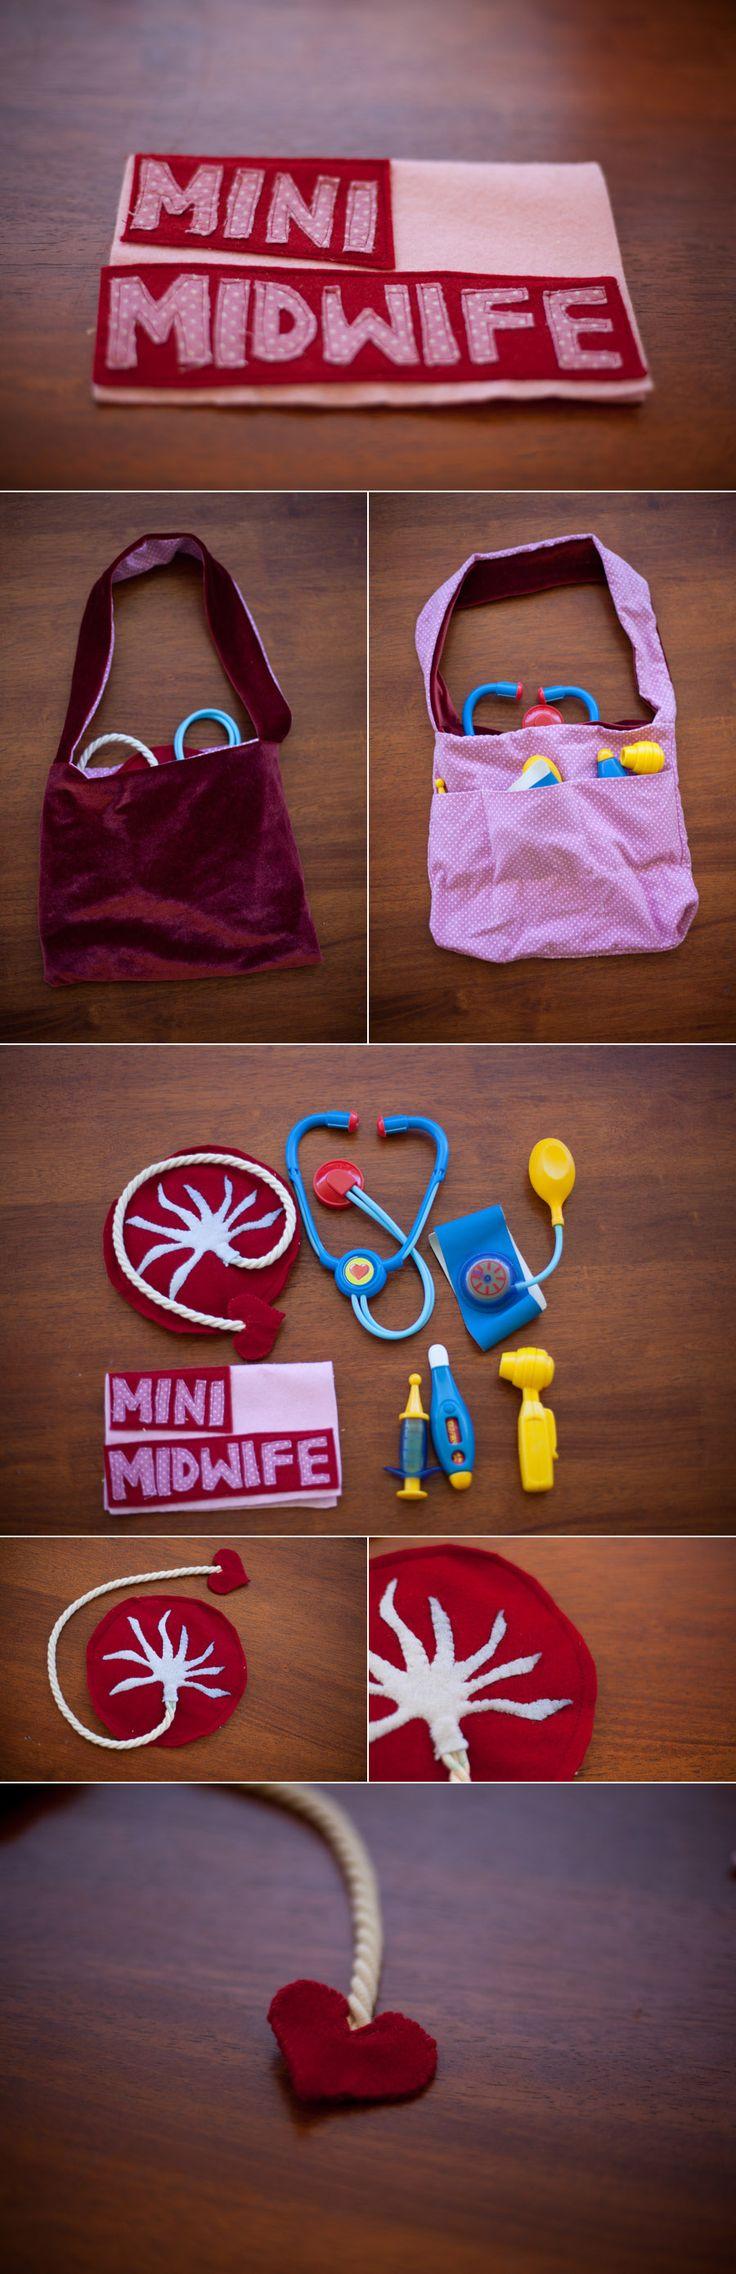 mini midwife kit, even has a placenta! @Heidi Taylor